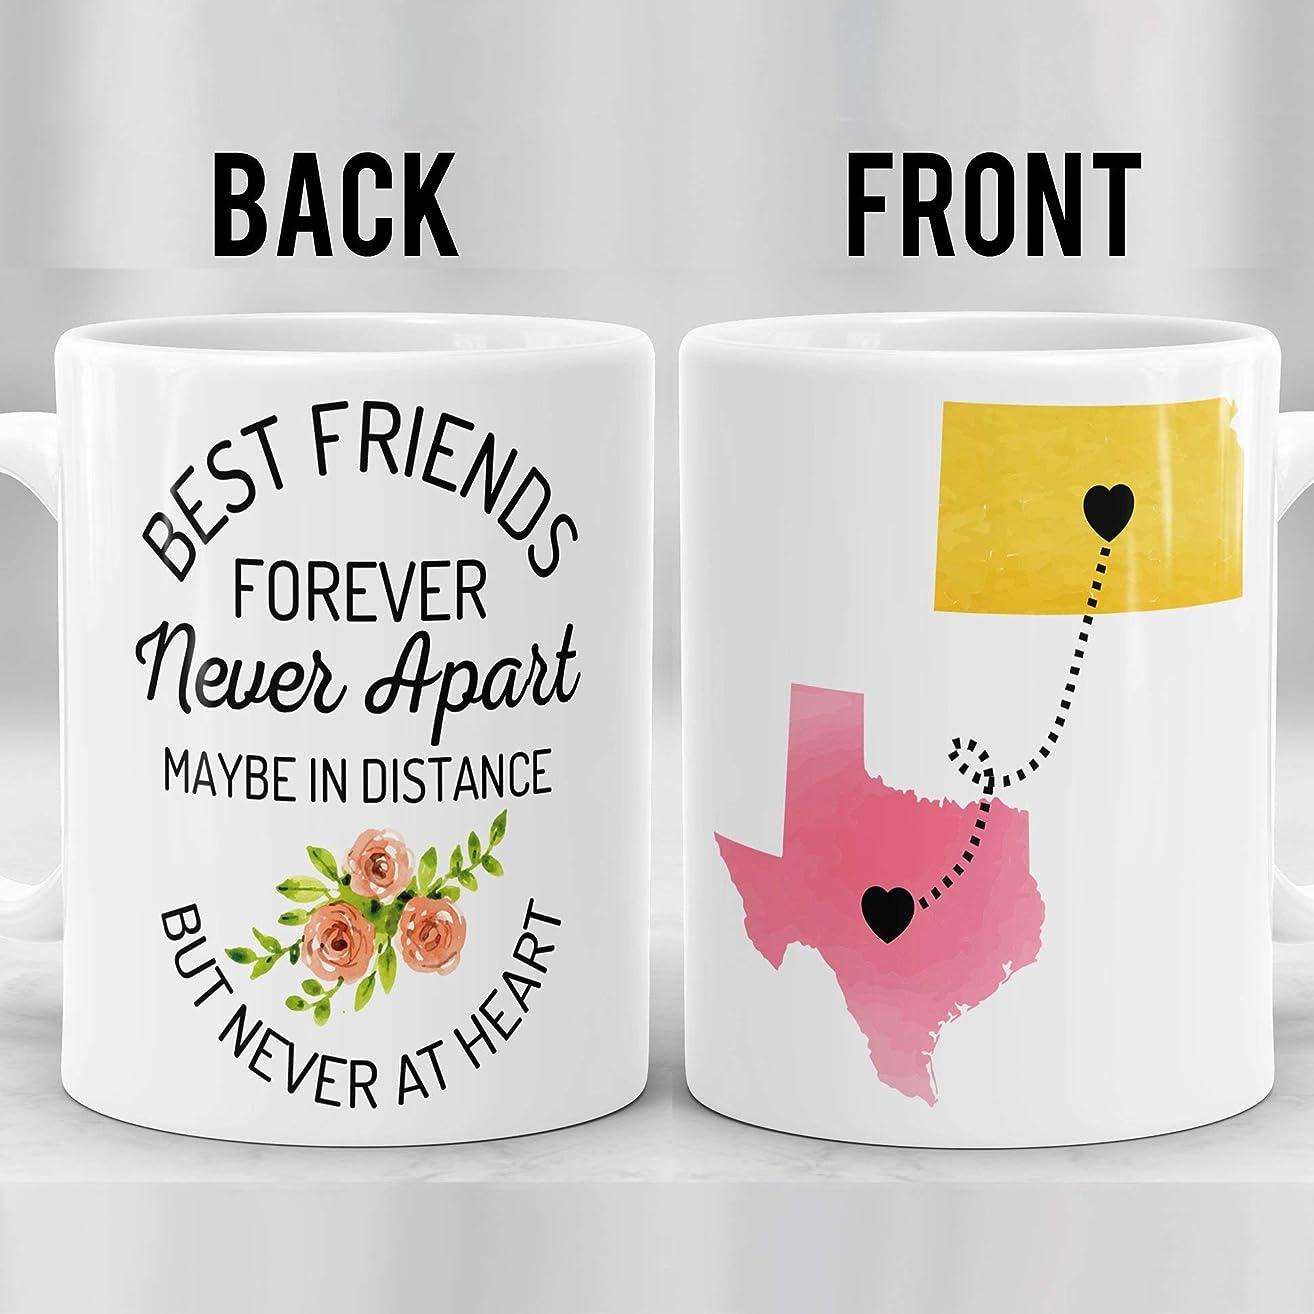 Best Friends Long Distance Mug, Moving Mug For Friend, State To State Friendship Mug, Going Away Gift, Best Friends Forever Mug